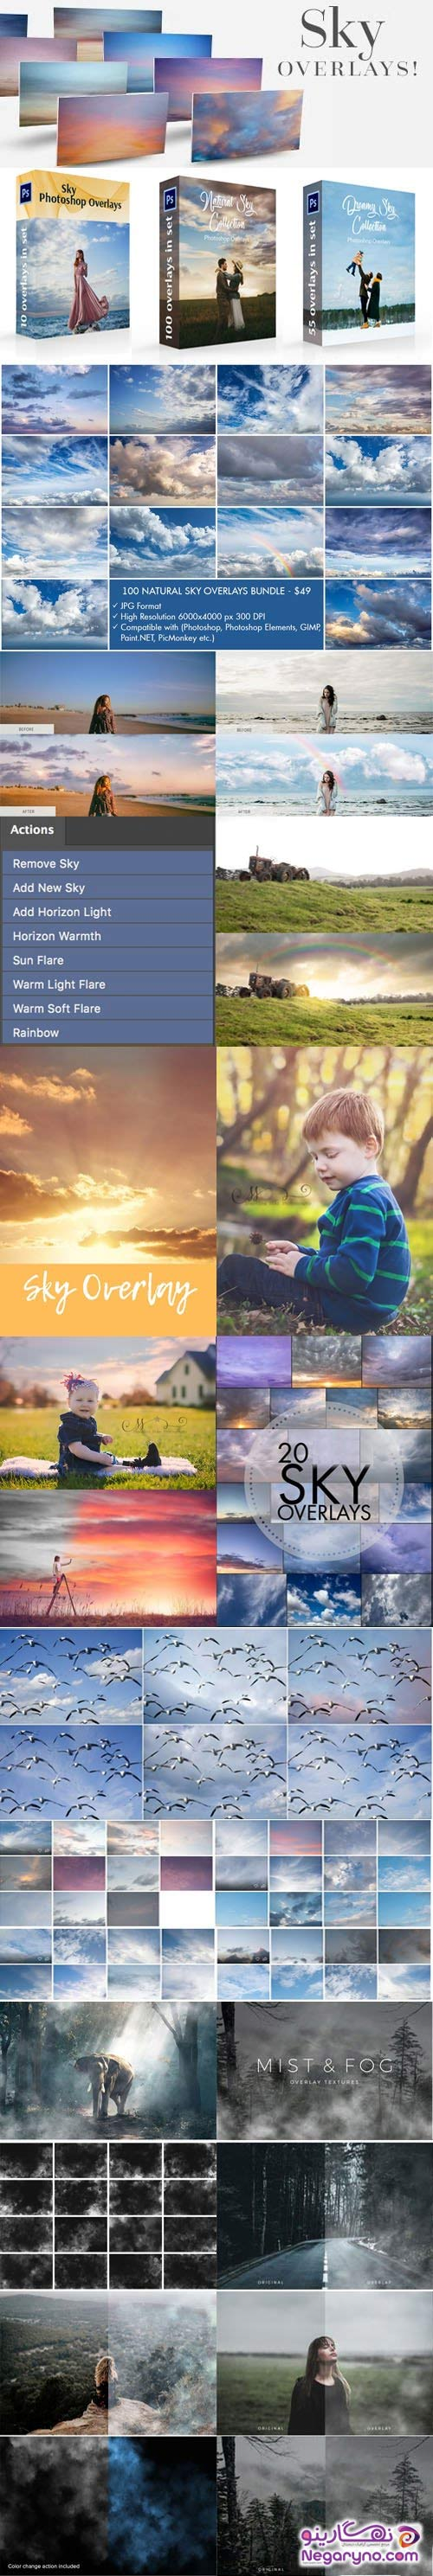 مجموعه Overlay آسمان